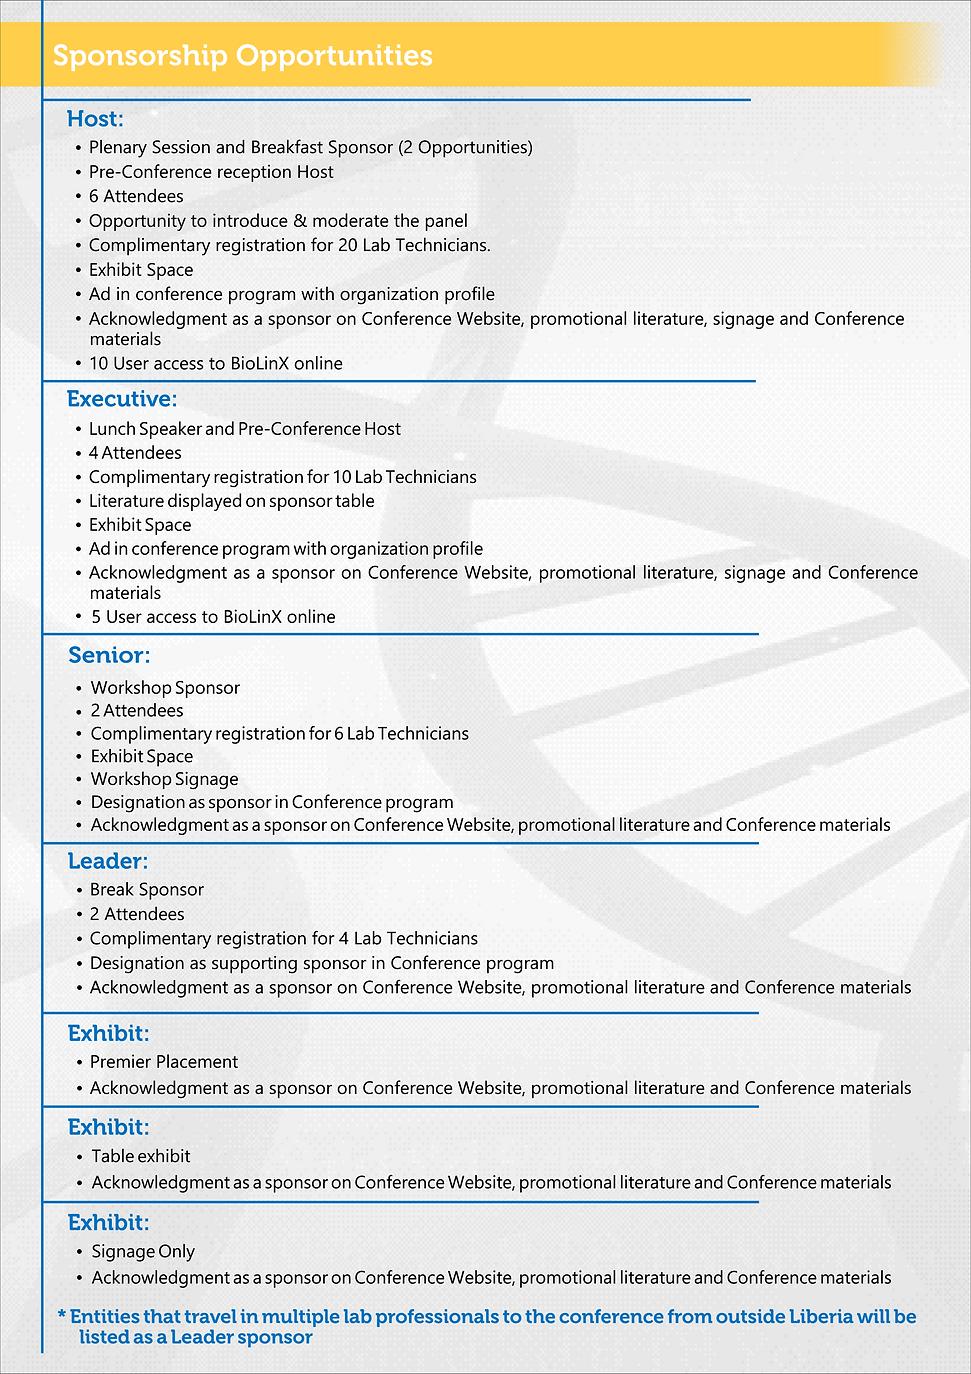 Sponsorship-Brochure_3.png